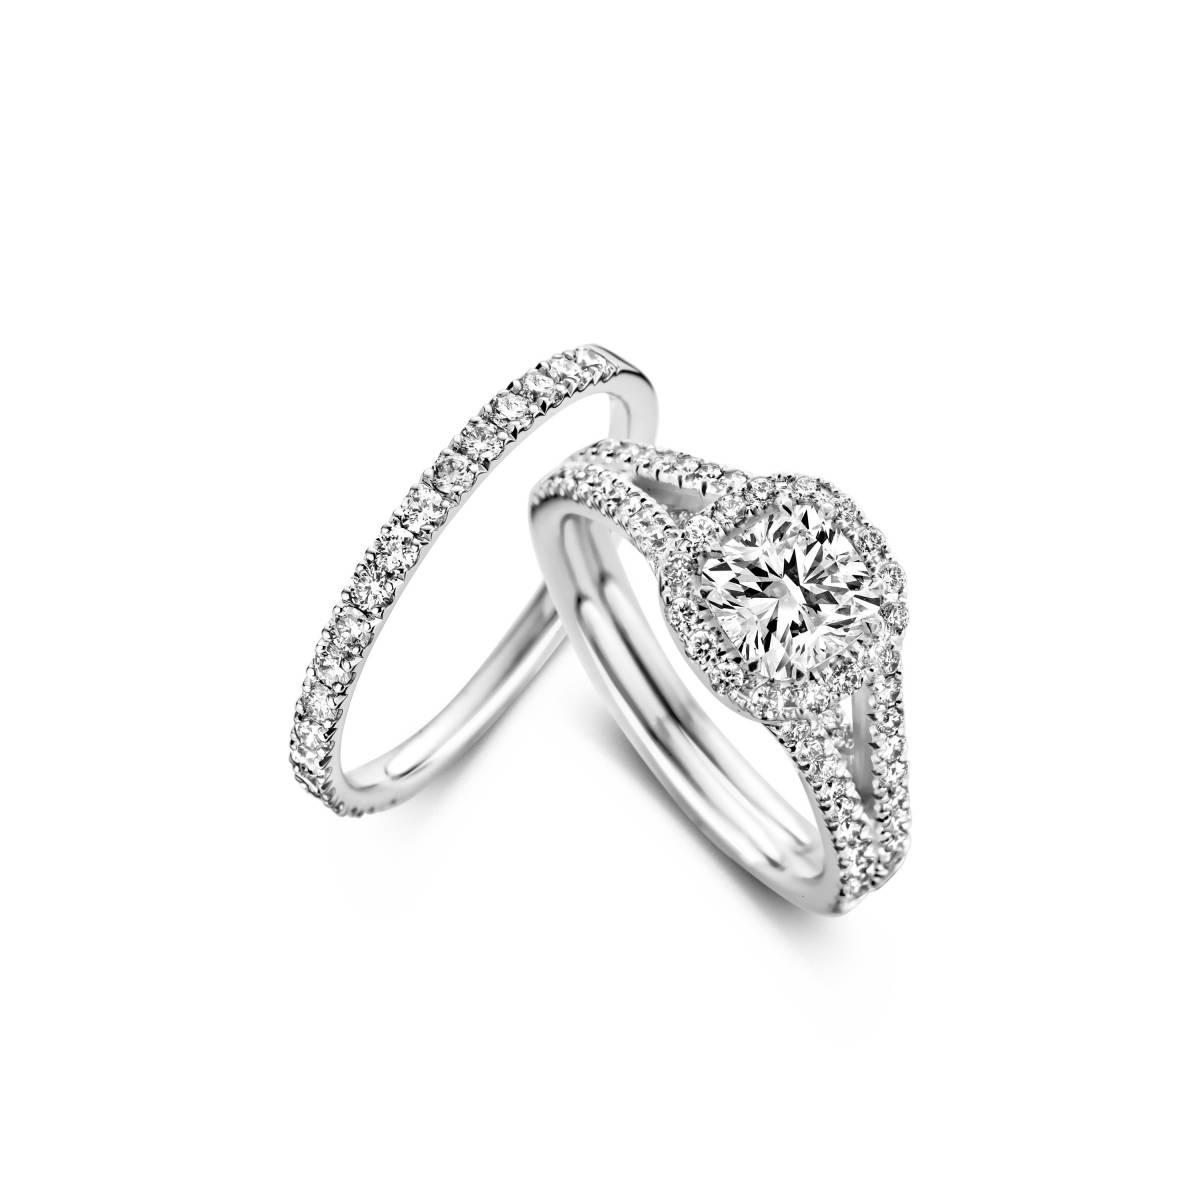 Juwelier Martens - Verlovingsringen - Trouwringen - Juwelen huwelijk - House of Weddings - 10